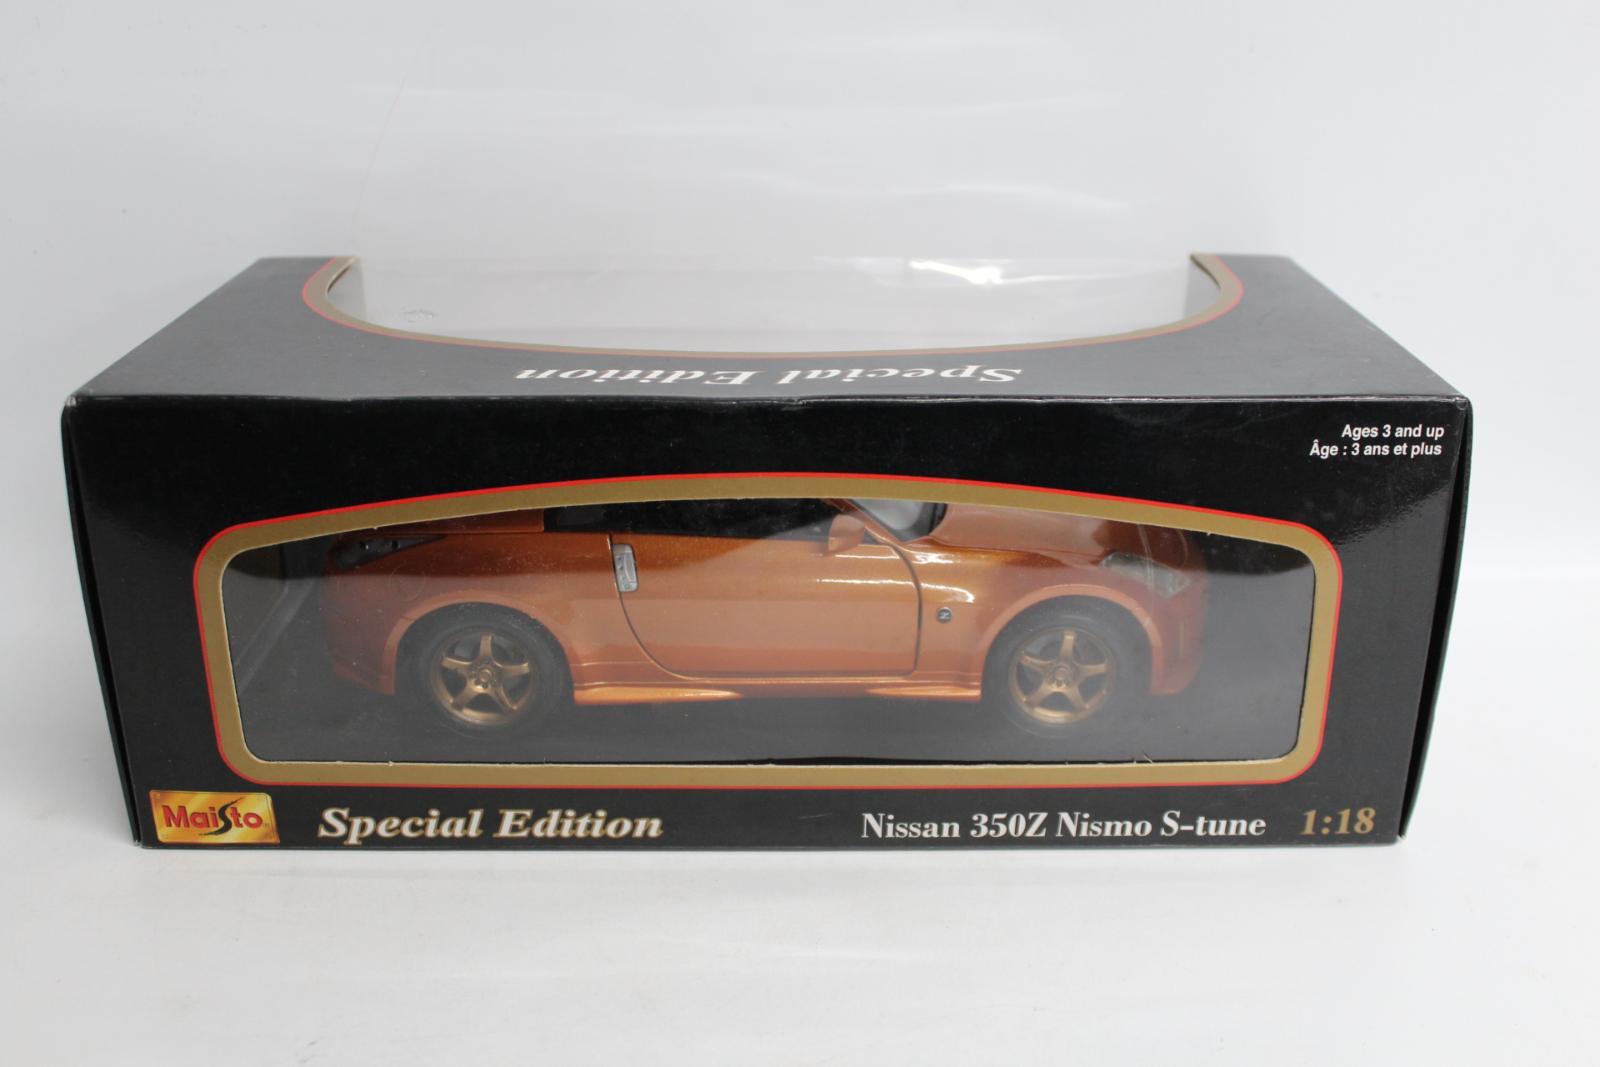 Maisto-31688-EDICIoN-Especial-Nissan-350z-Nismo-S-Tune-1-18-Escala-Modelo-de-Coche-Nuevo miniatura 4